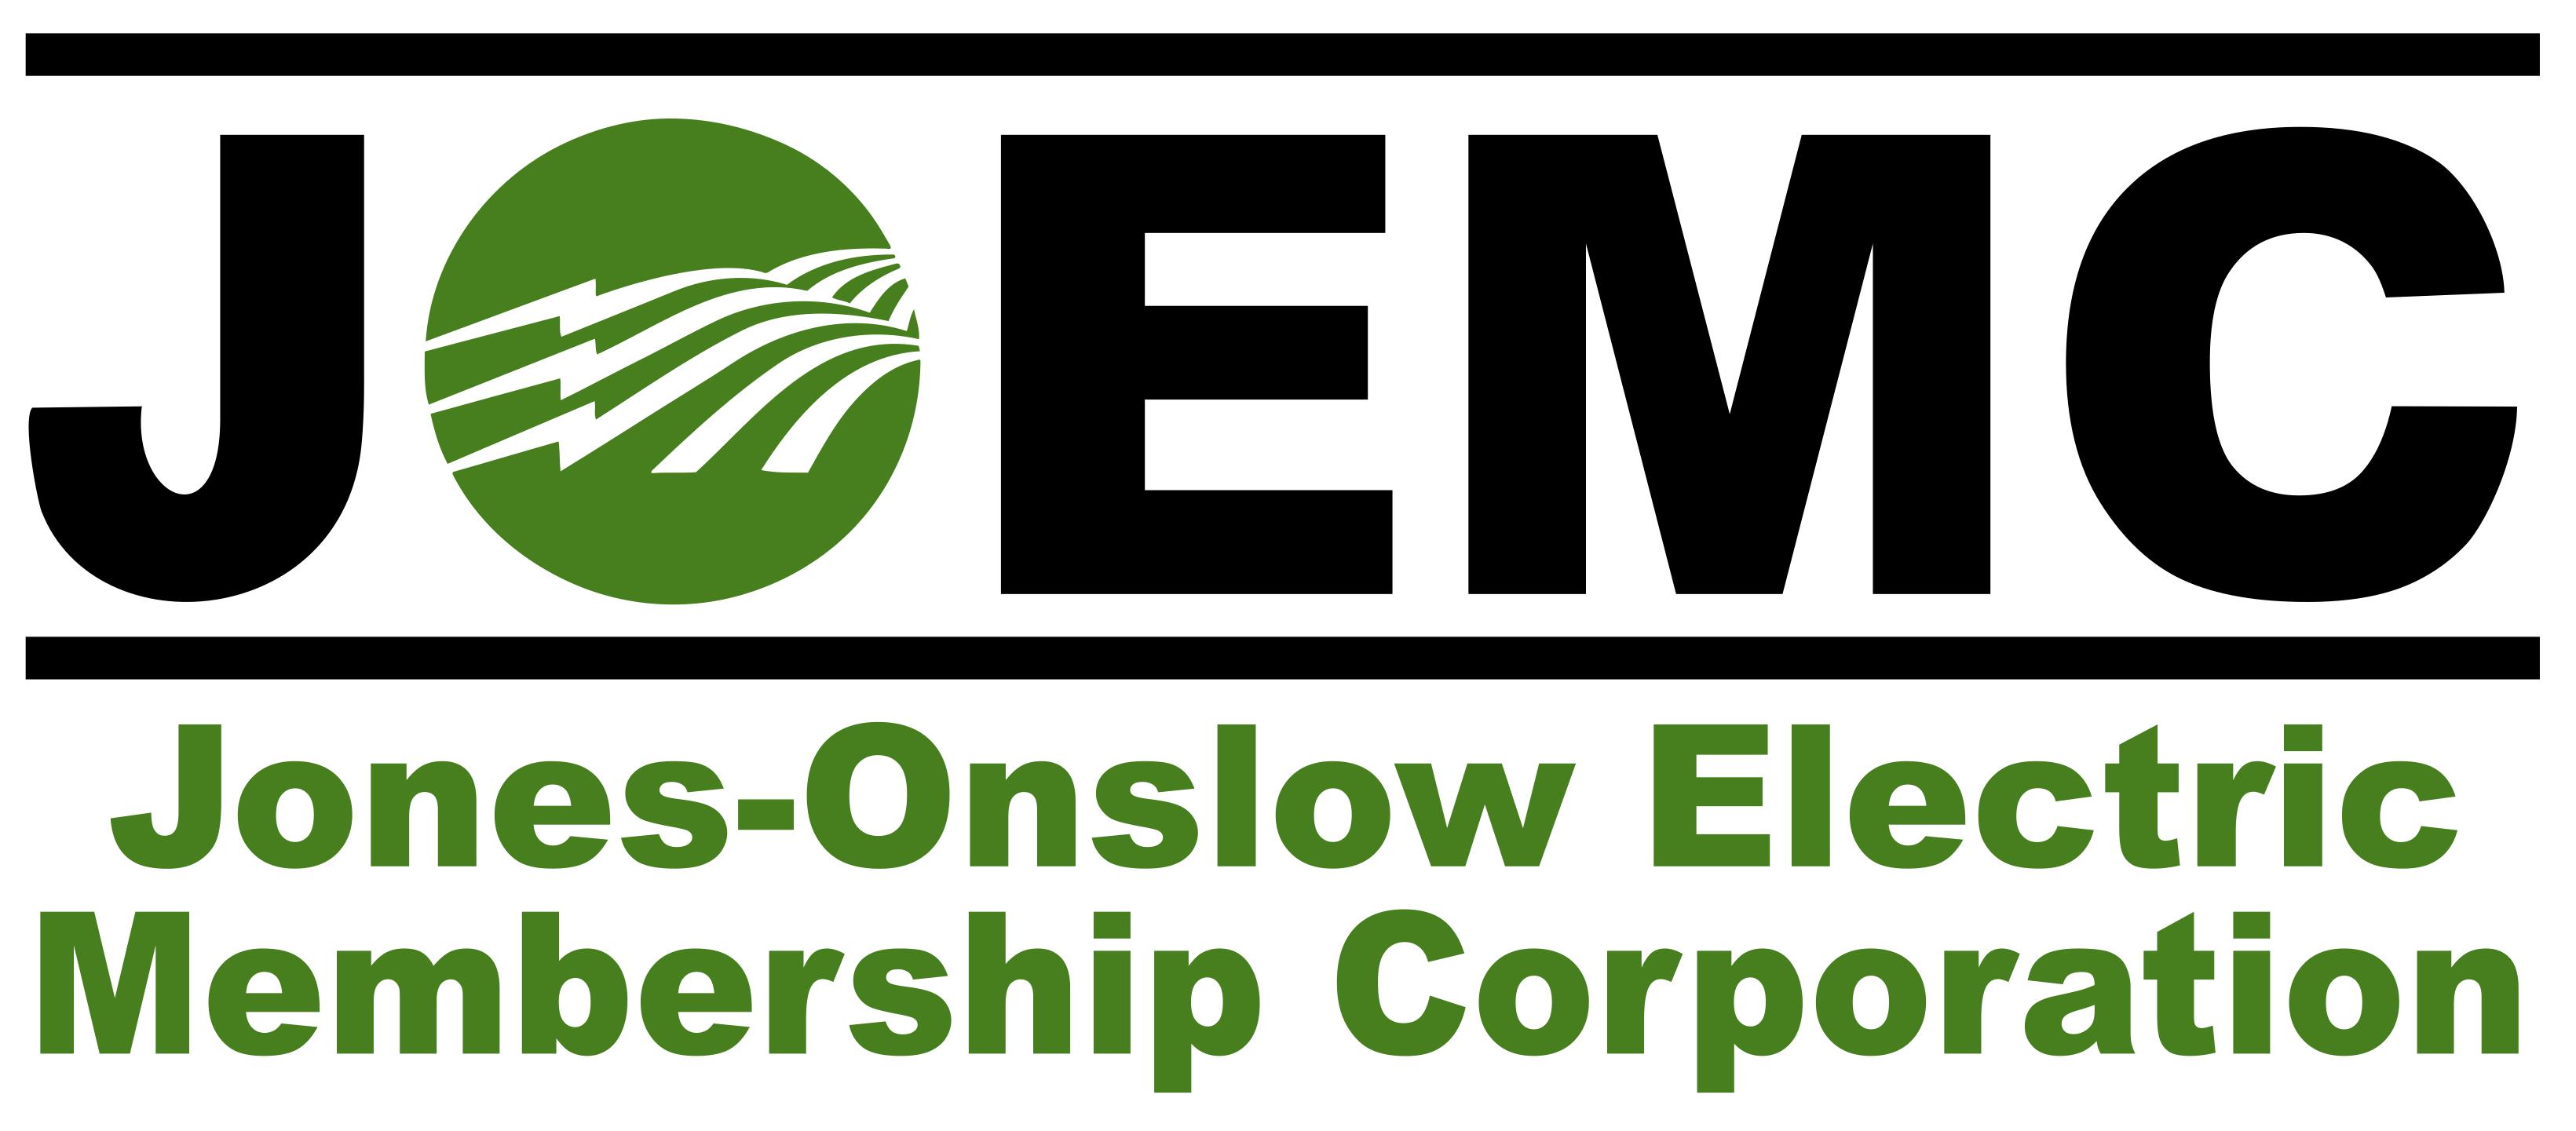 JOEMC logo